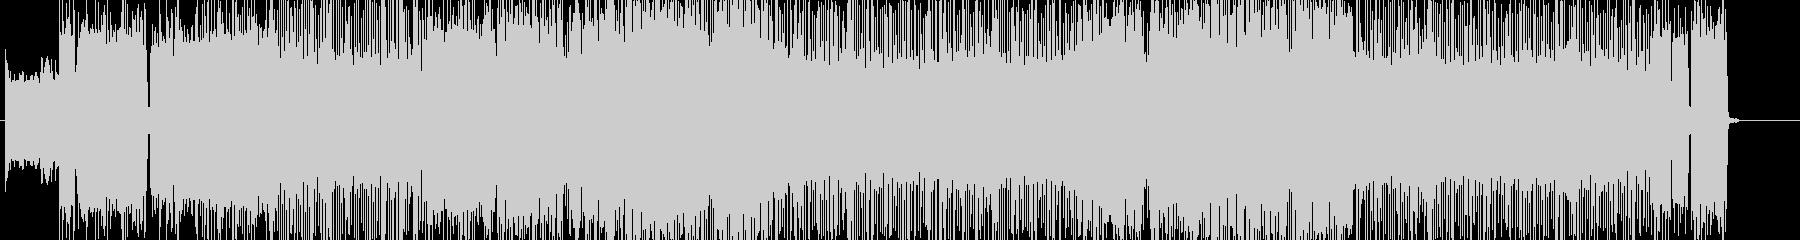 「HR/HM」「DEATH」BGM99の未再生の波形